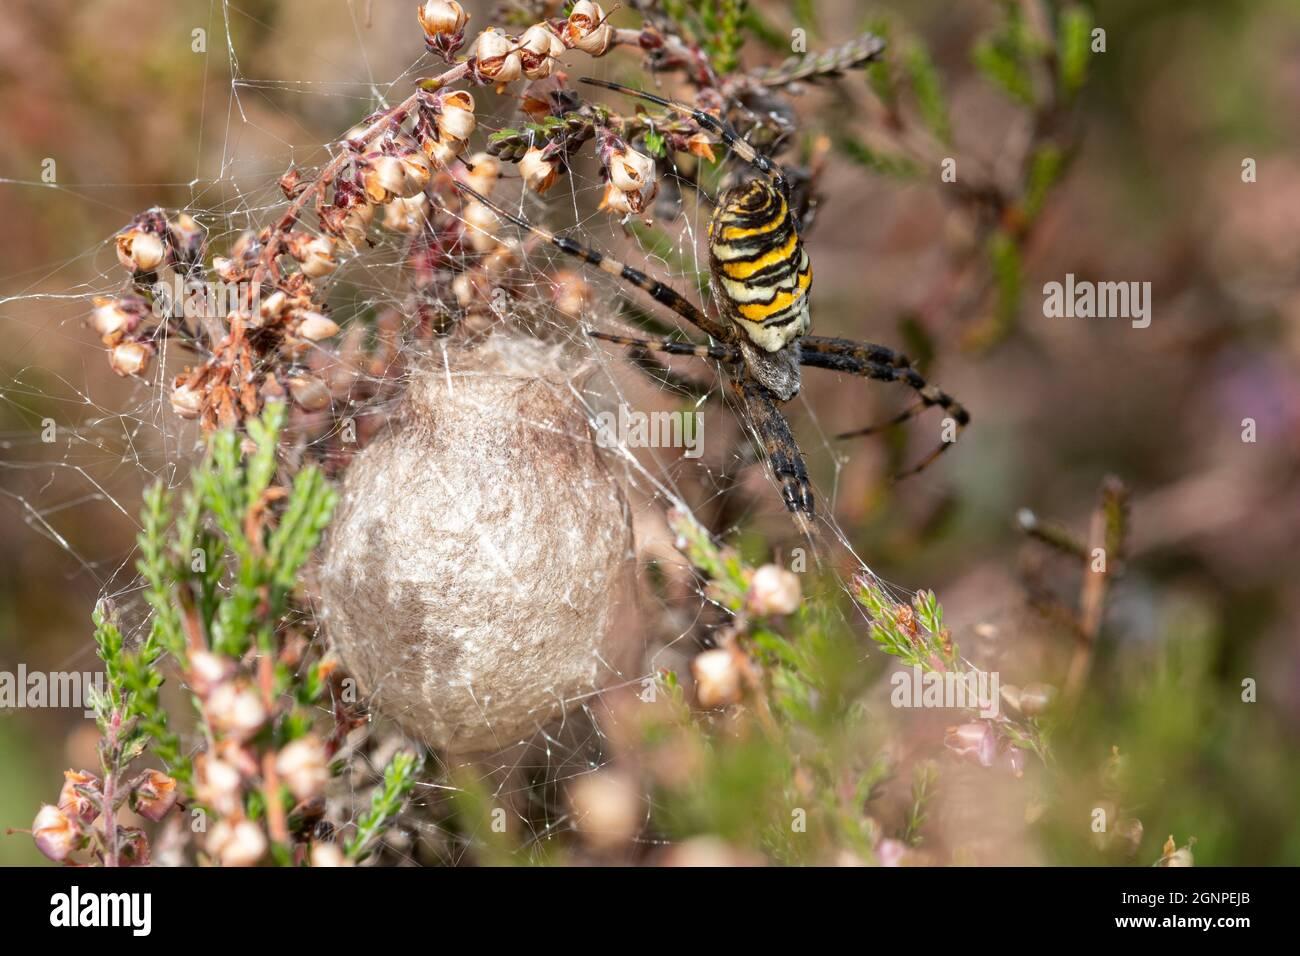 female-wasp-spider-argiope-bruennichi-guarding-her-egg-sac-among-heather-hampshire-heathland-during-september-uk-2GNPEJB.jpg